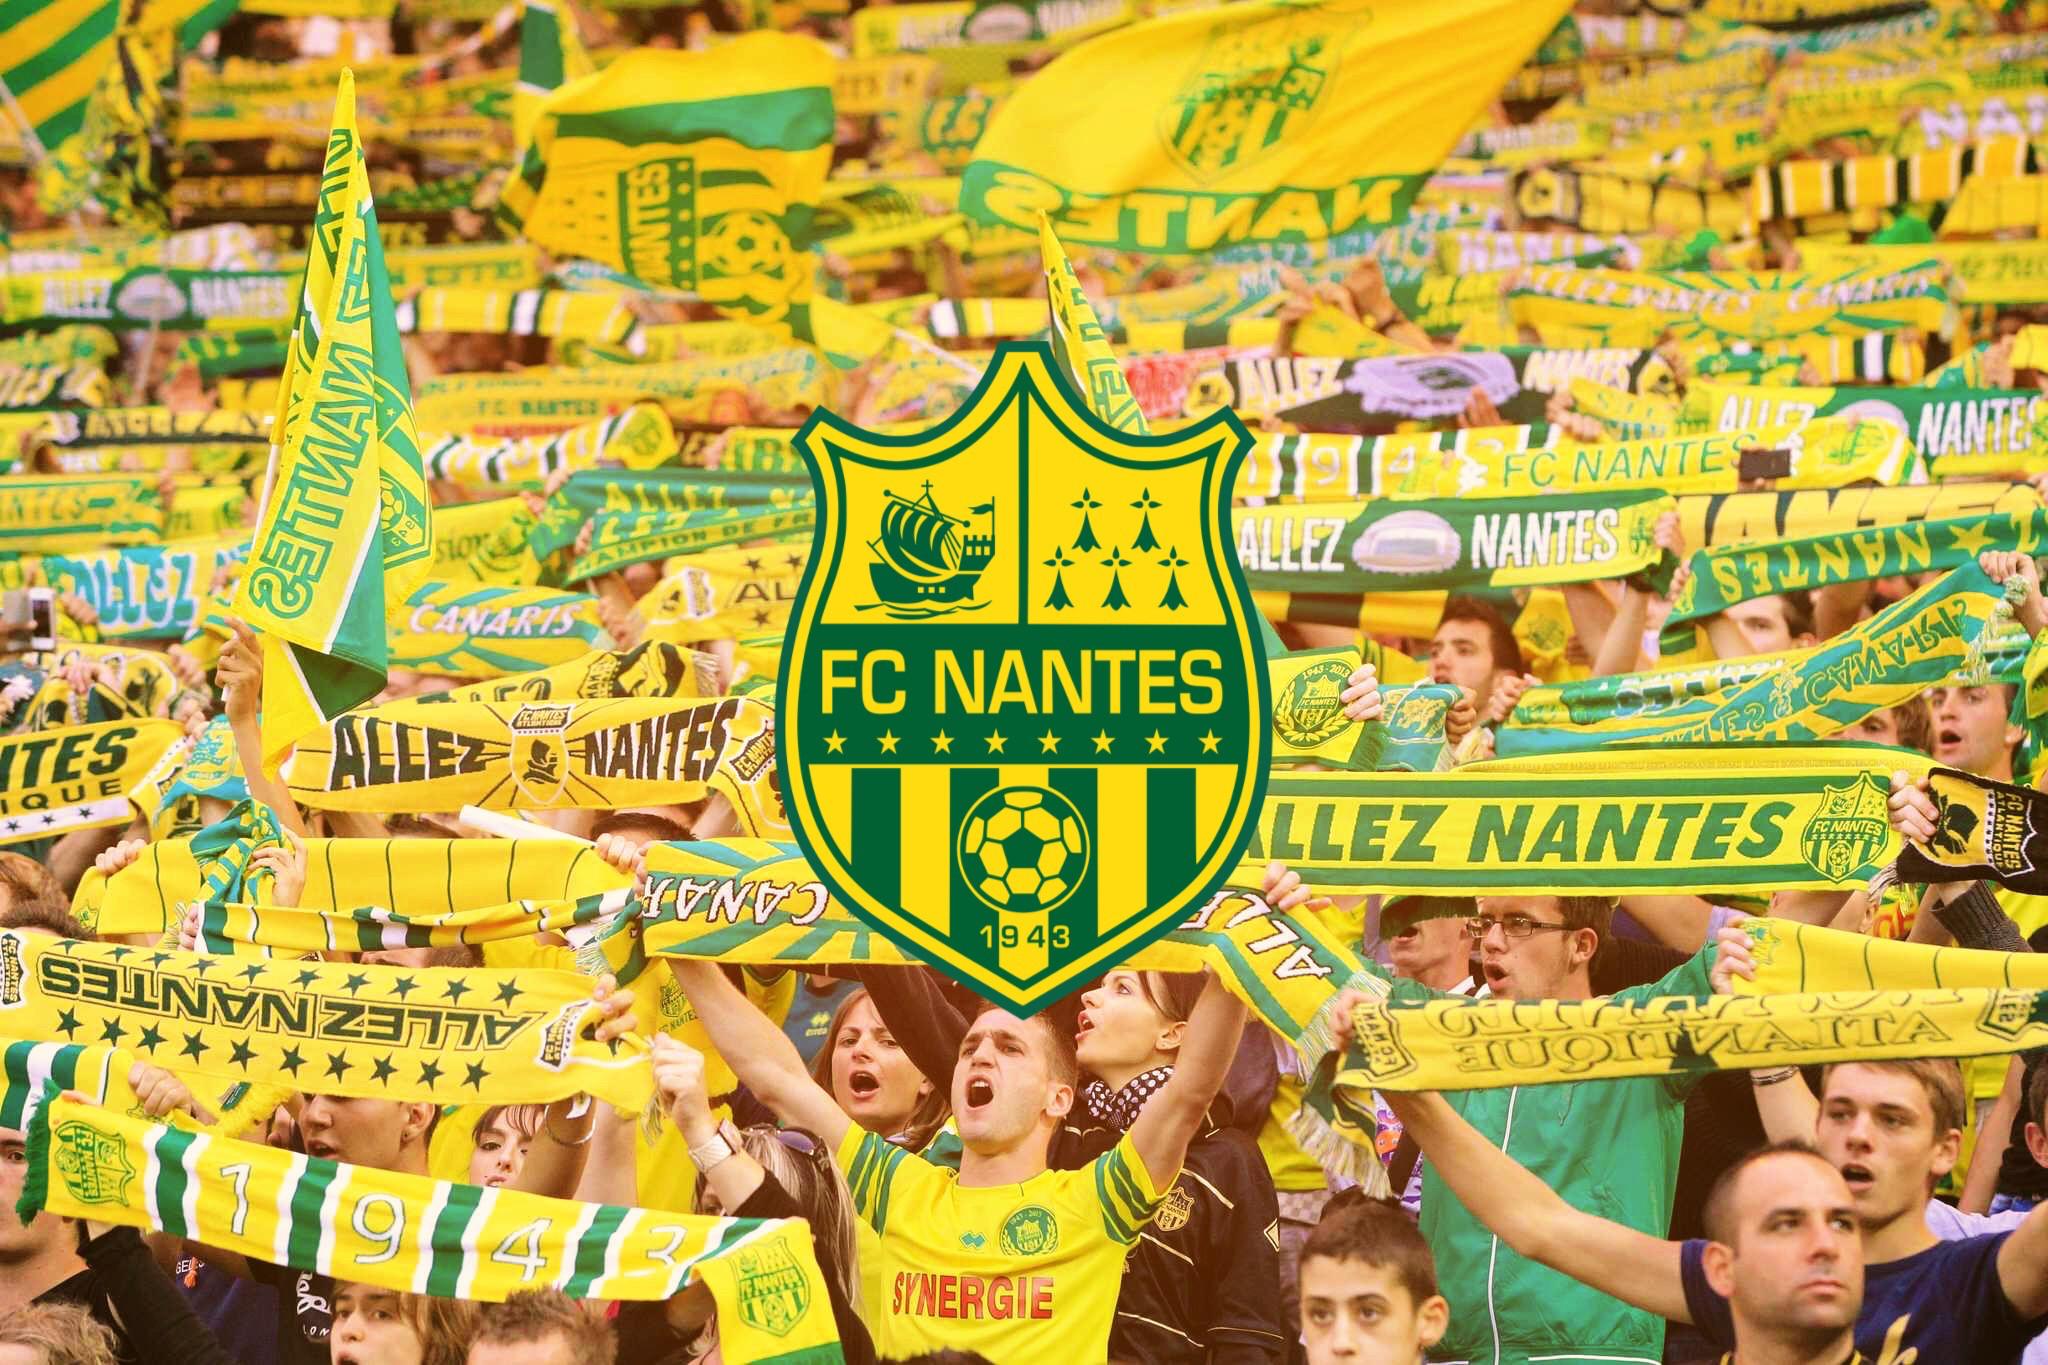 Nantes – tęsknota za trofeami